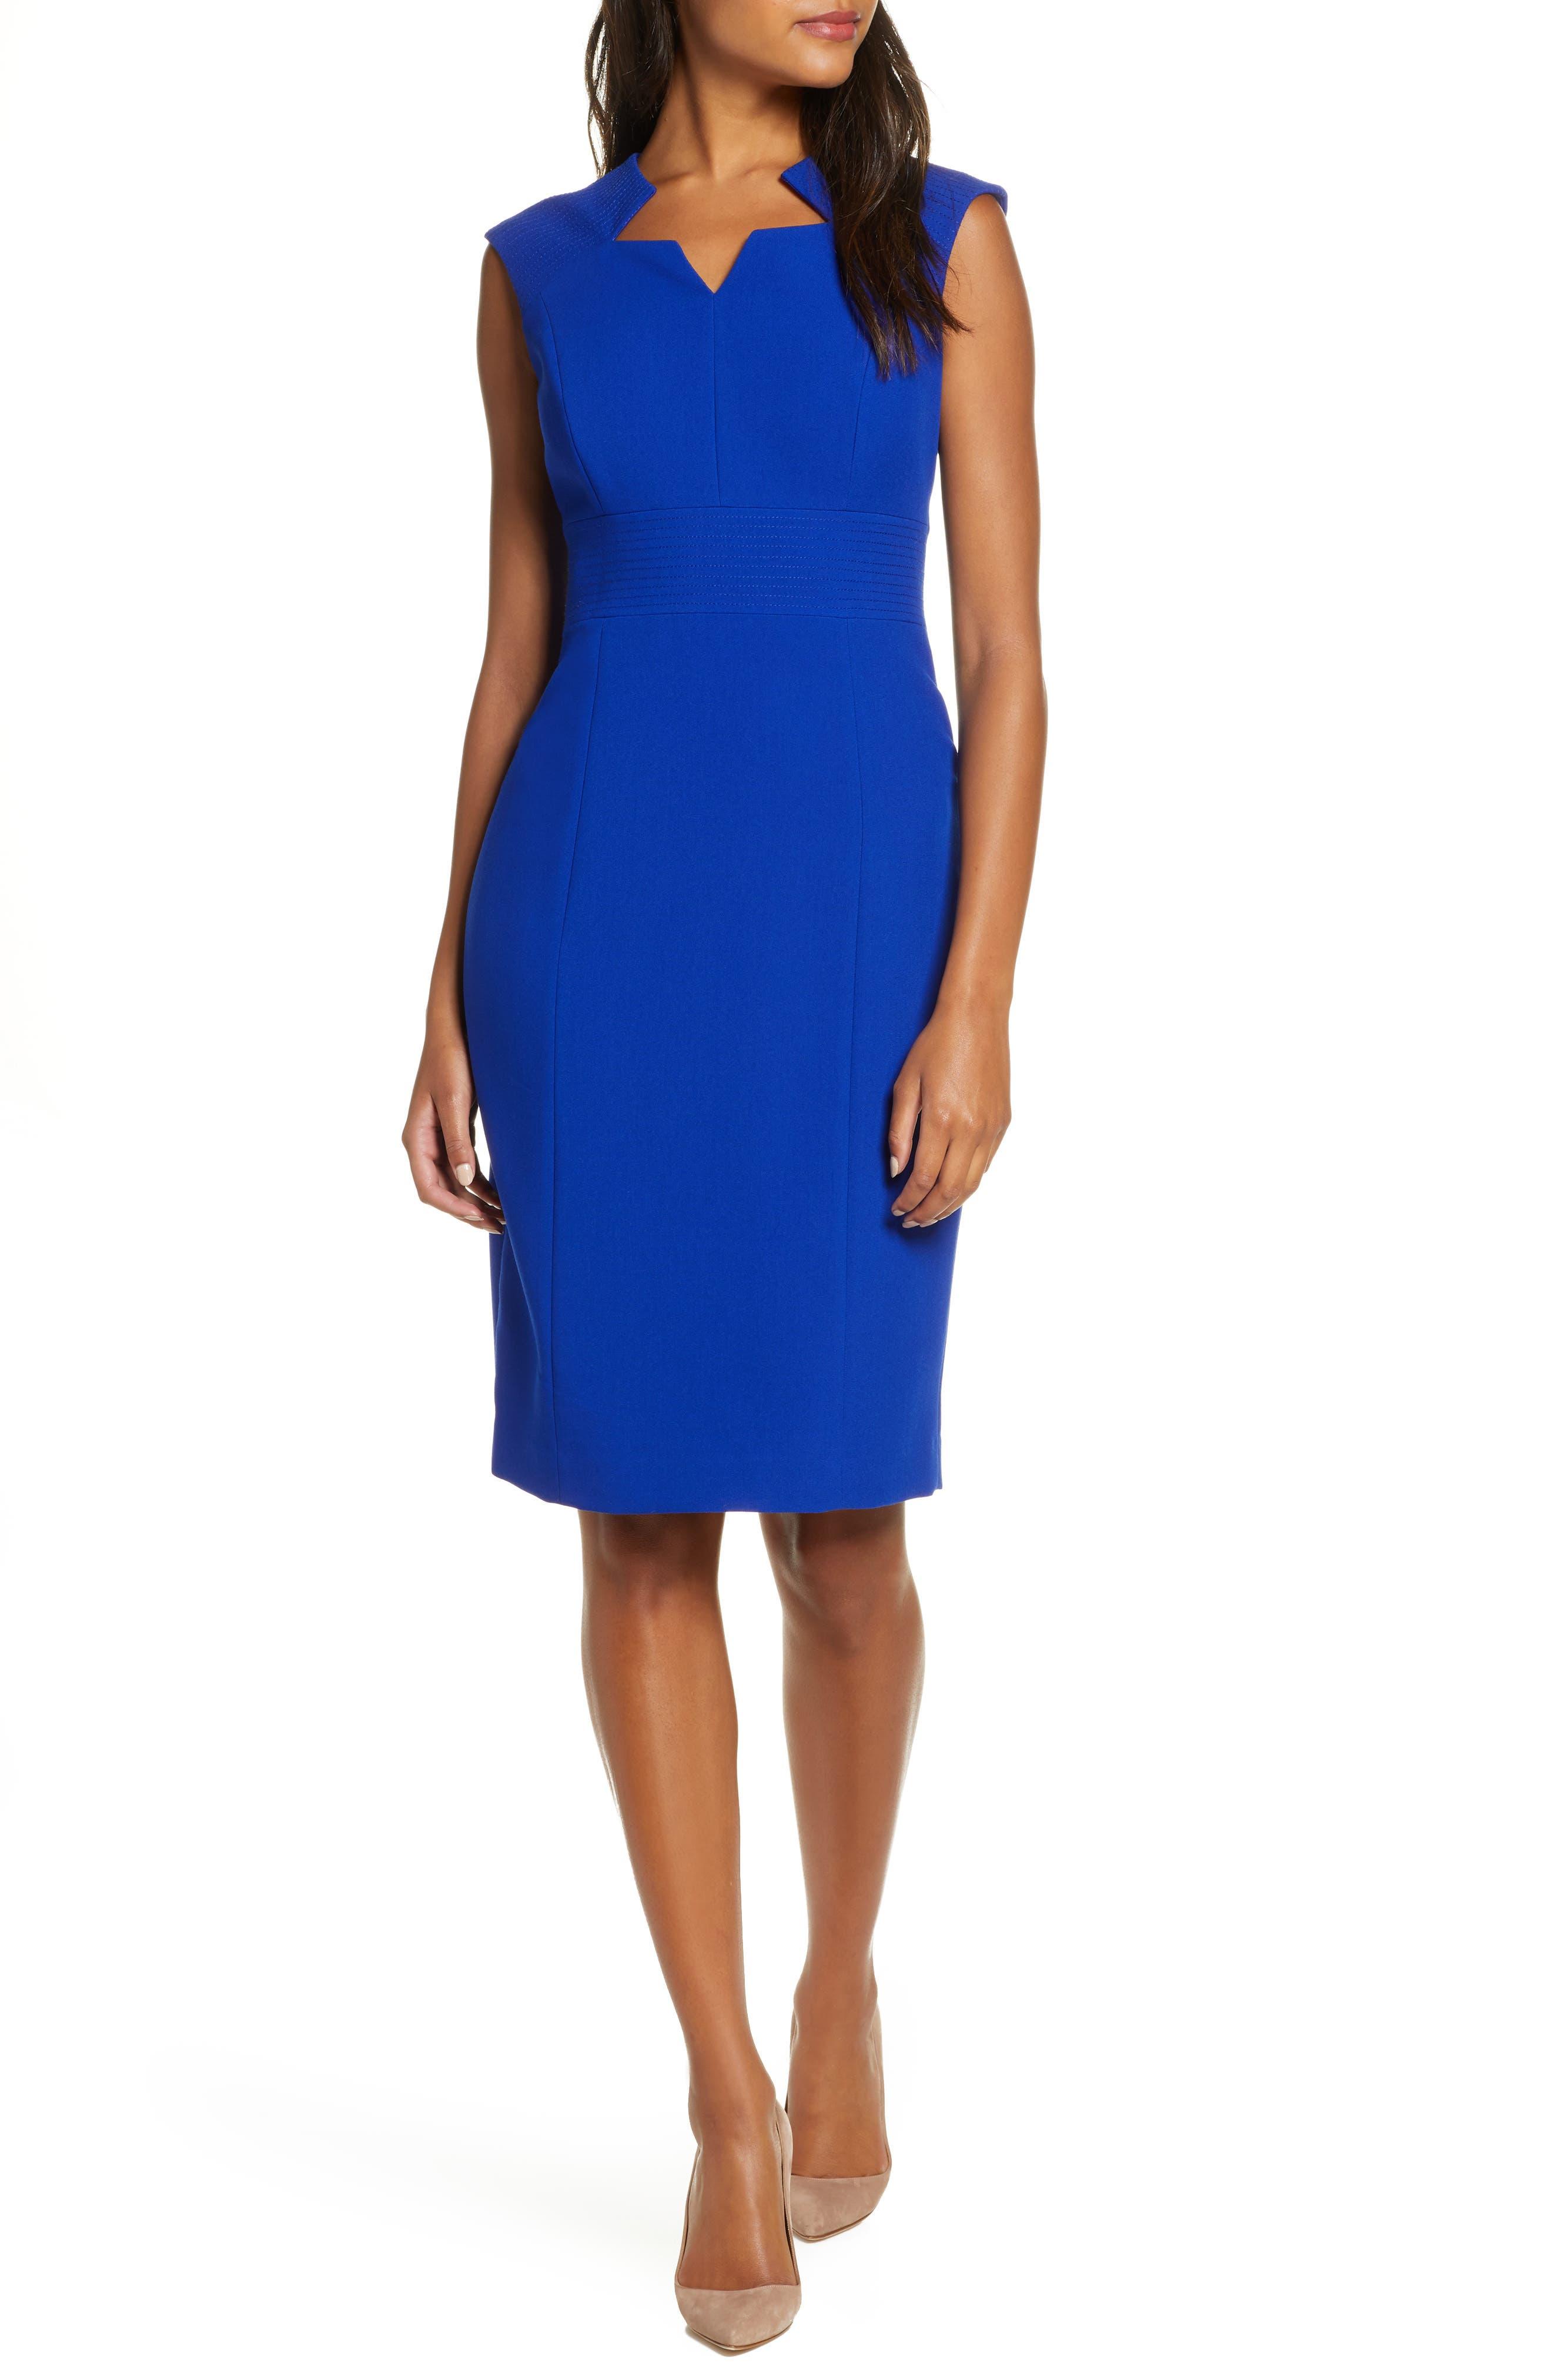 Tahari Star Neckline Crepe Sheath Dress, Blue